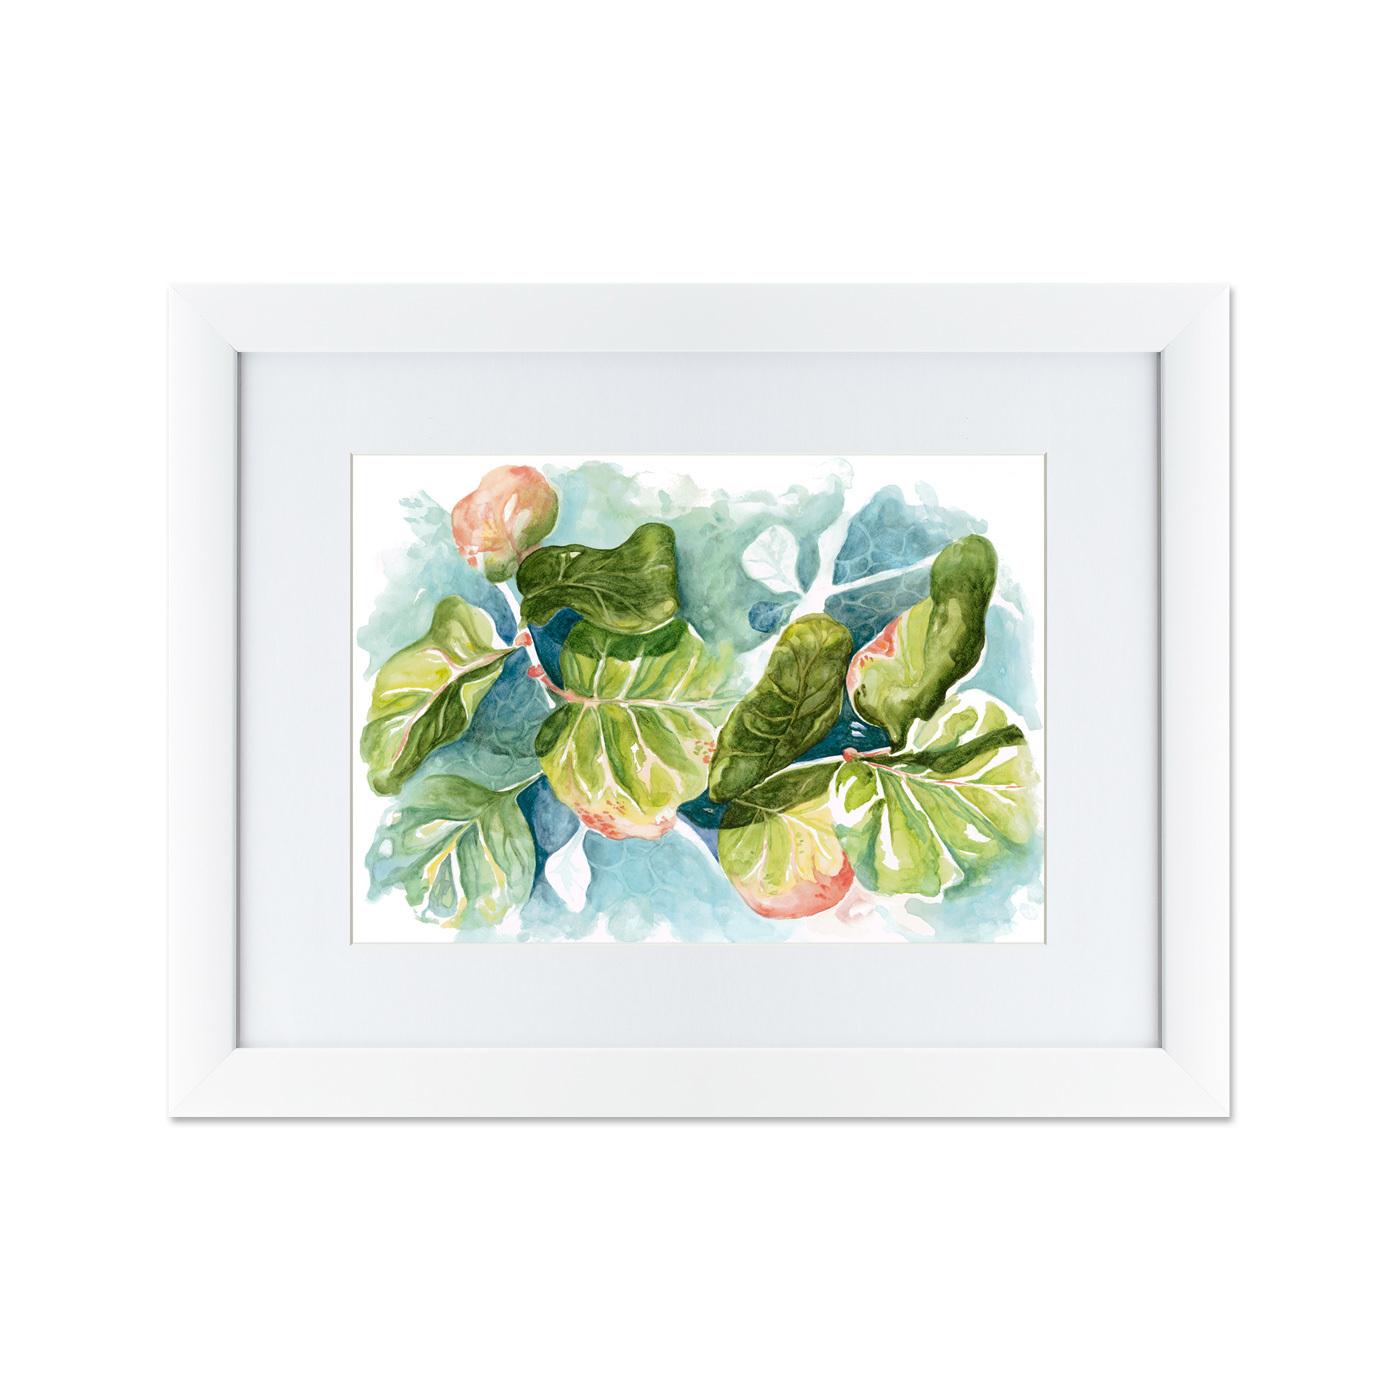 {} Картины в Квартиру Картина Морской Виноград (47х60 см) картины в квартиру картина морской обитатель 2 35х35 см